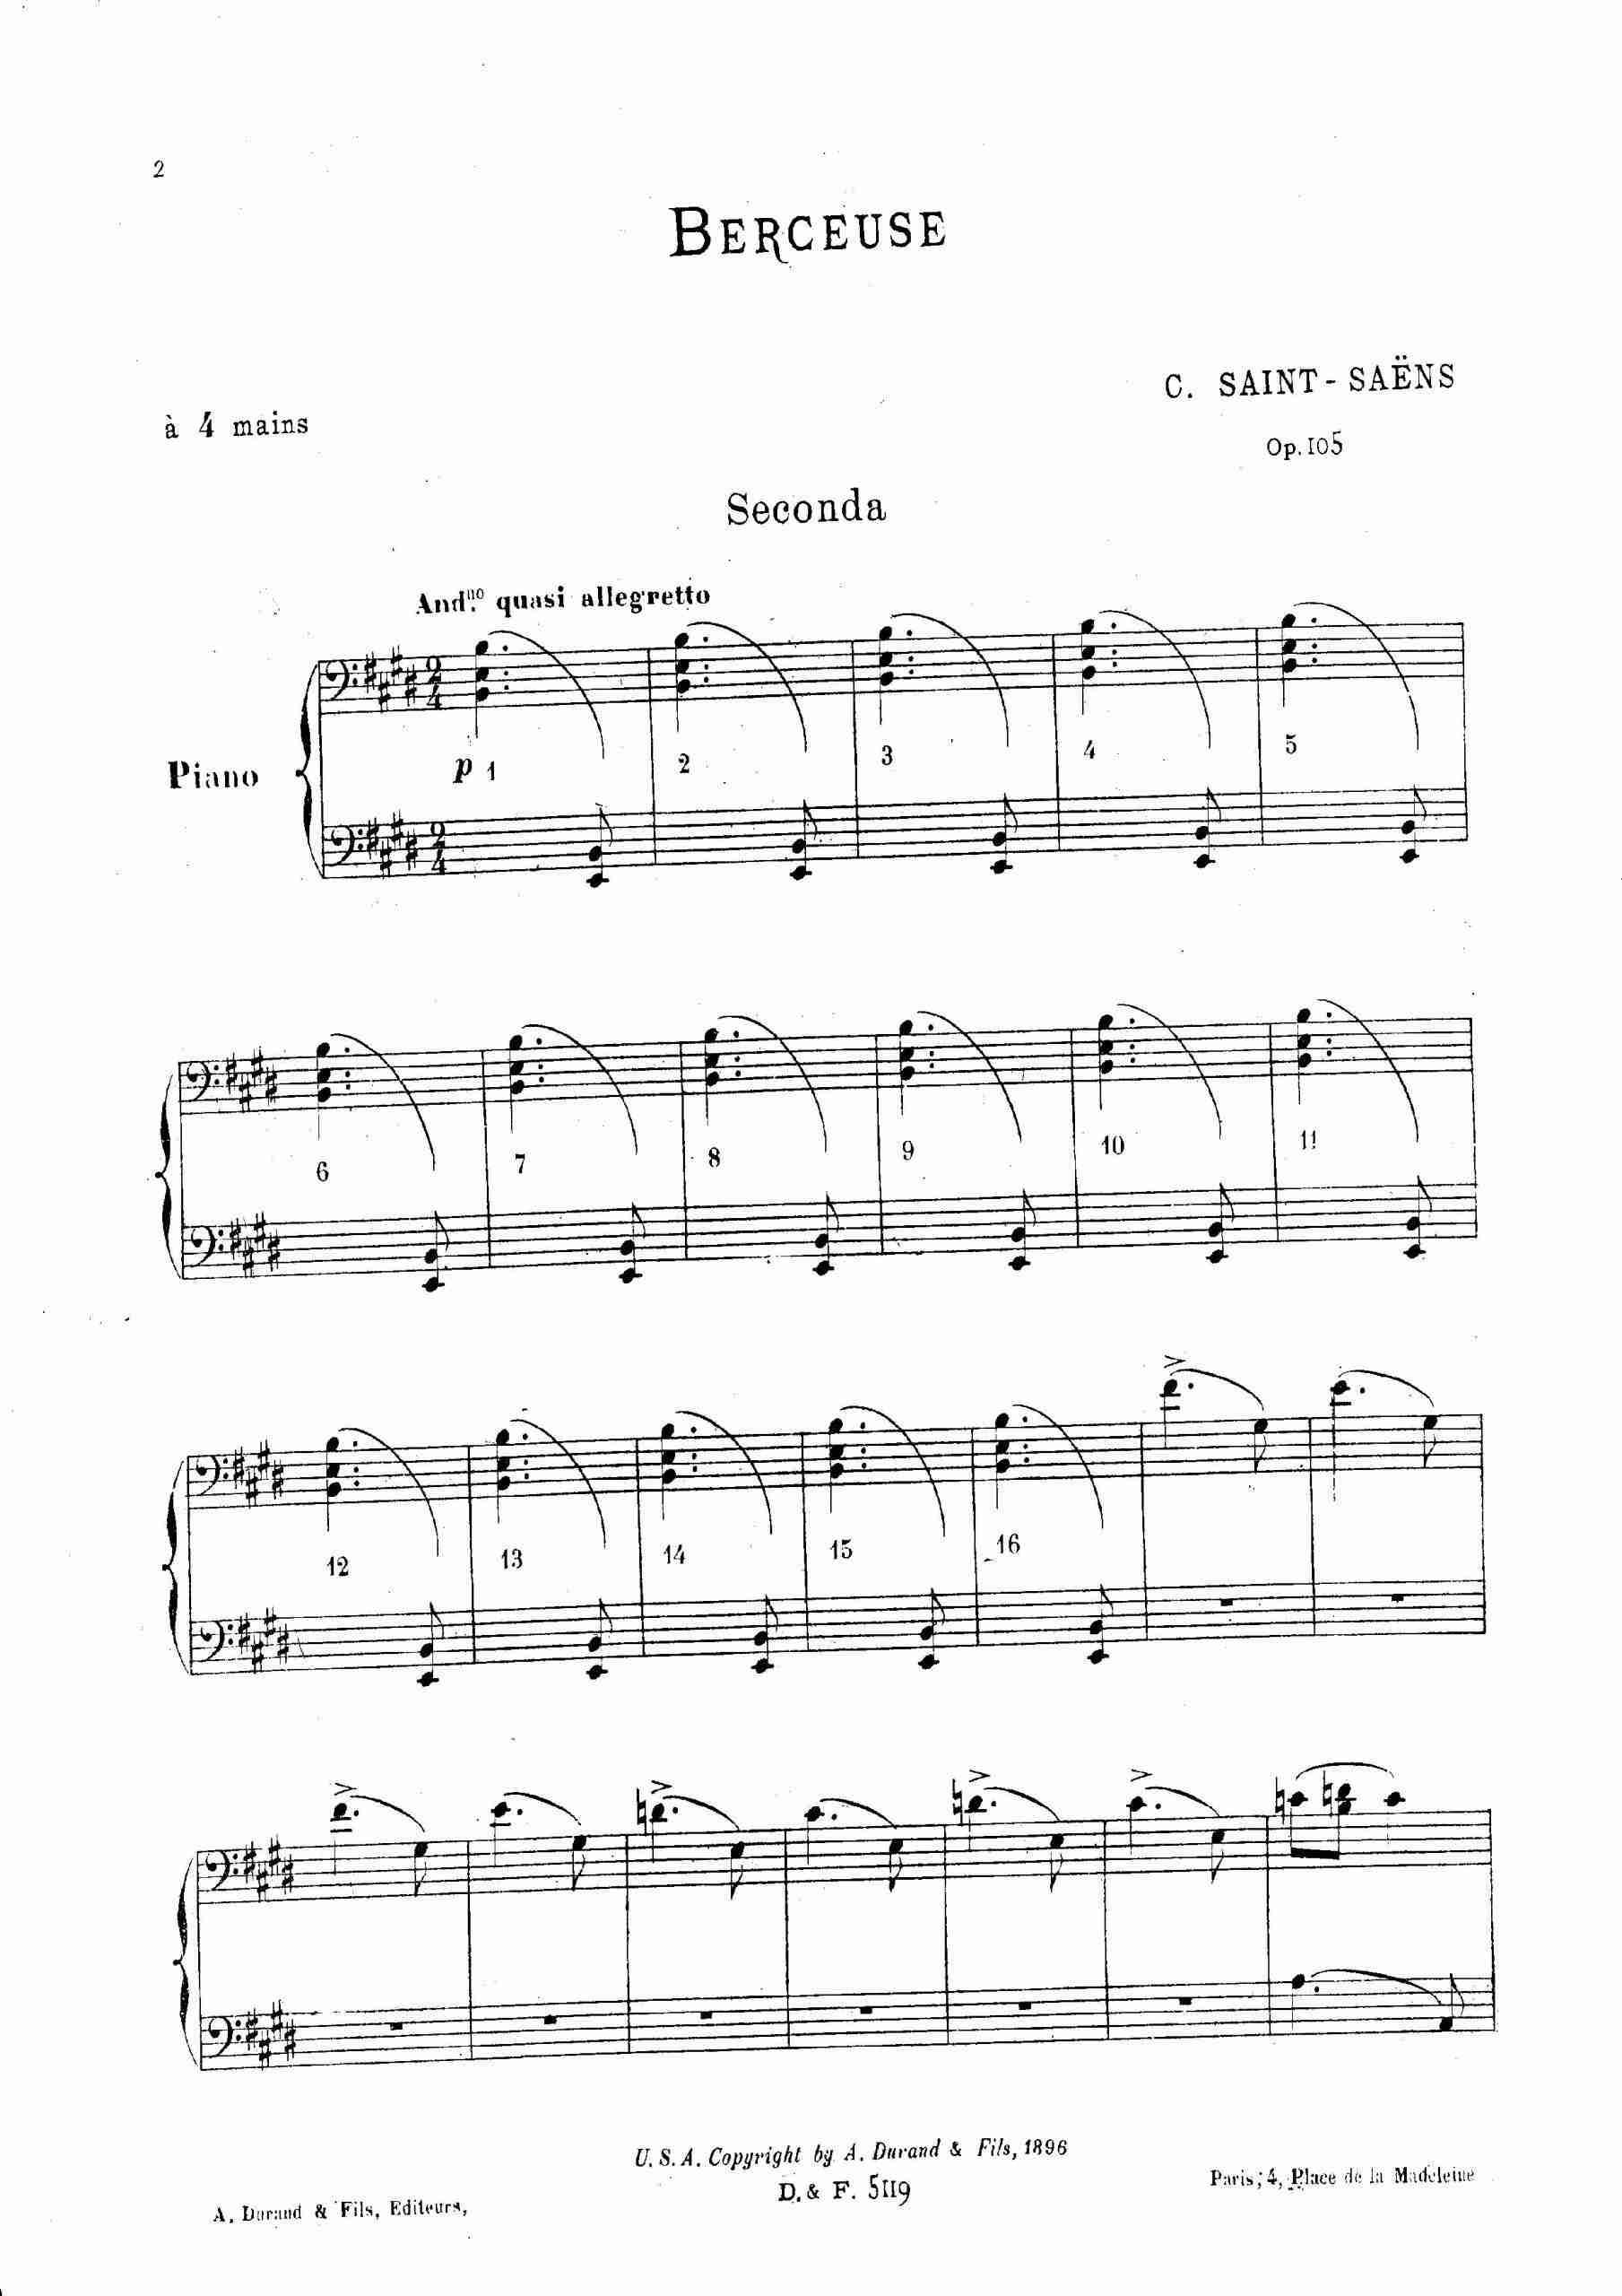 Saint-Saëns, Camille - Berceuse, Op.105